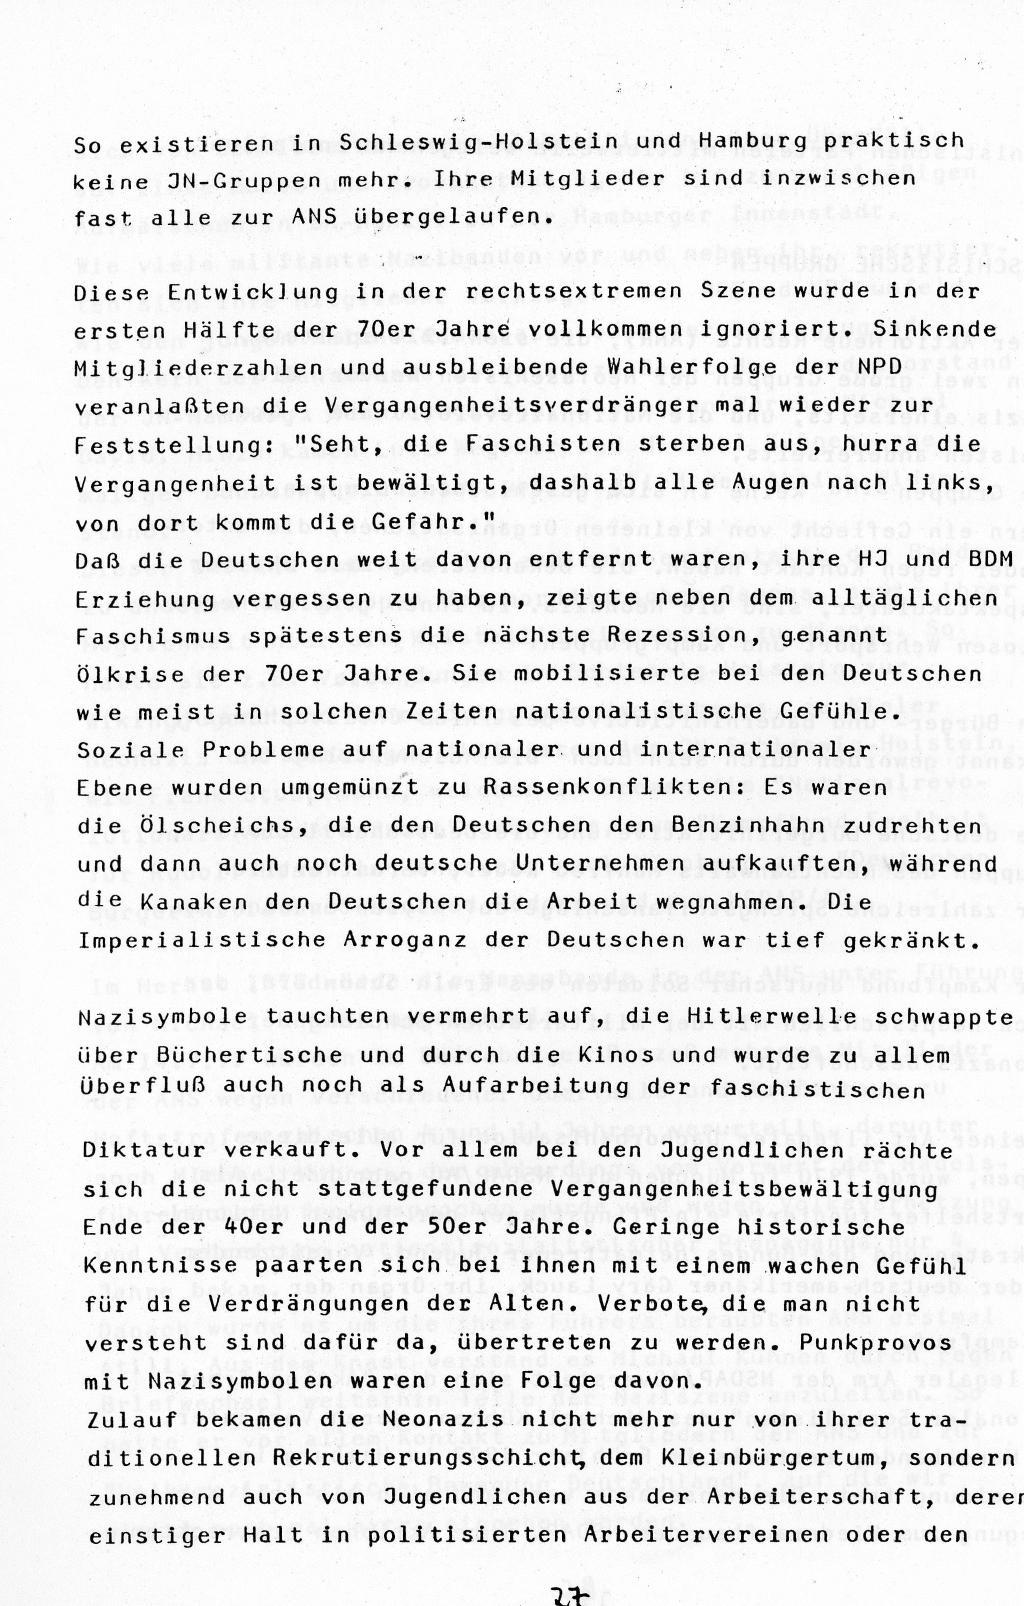 Berlin_1983_Autonome_Gruppen_Faschismus_im_Kapitalismus_27